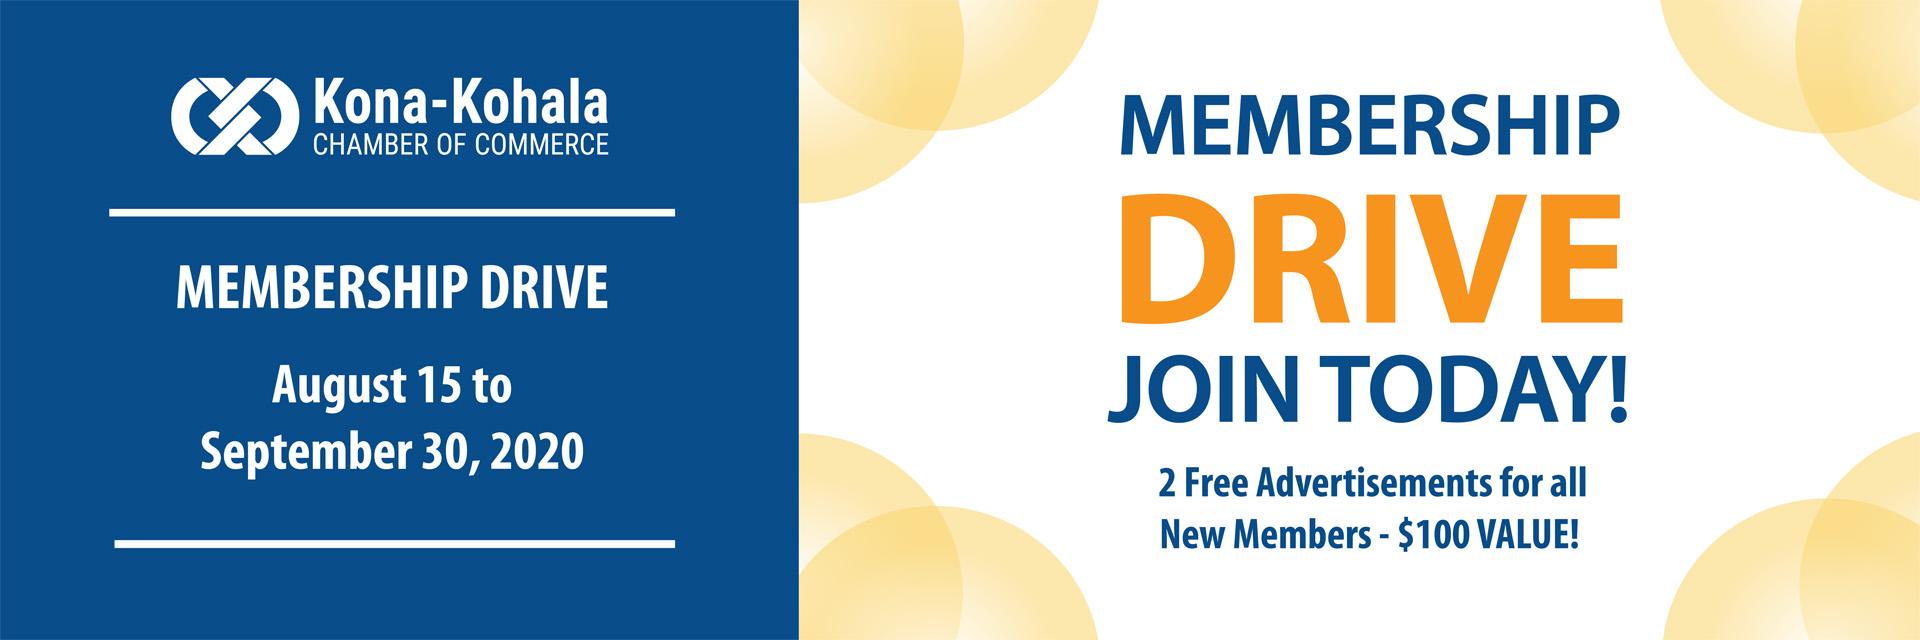 Membership-Drive-Slider-B.jpg